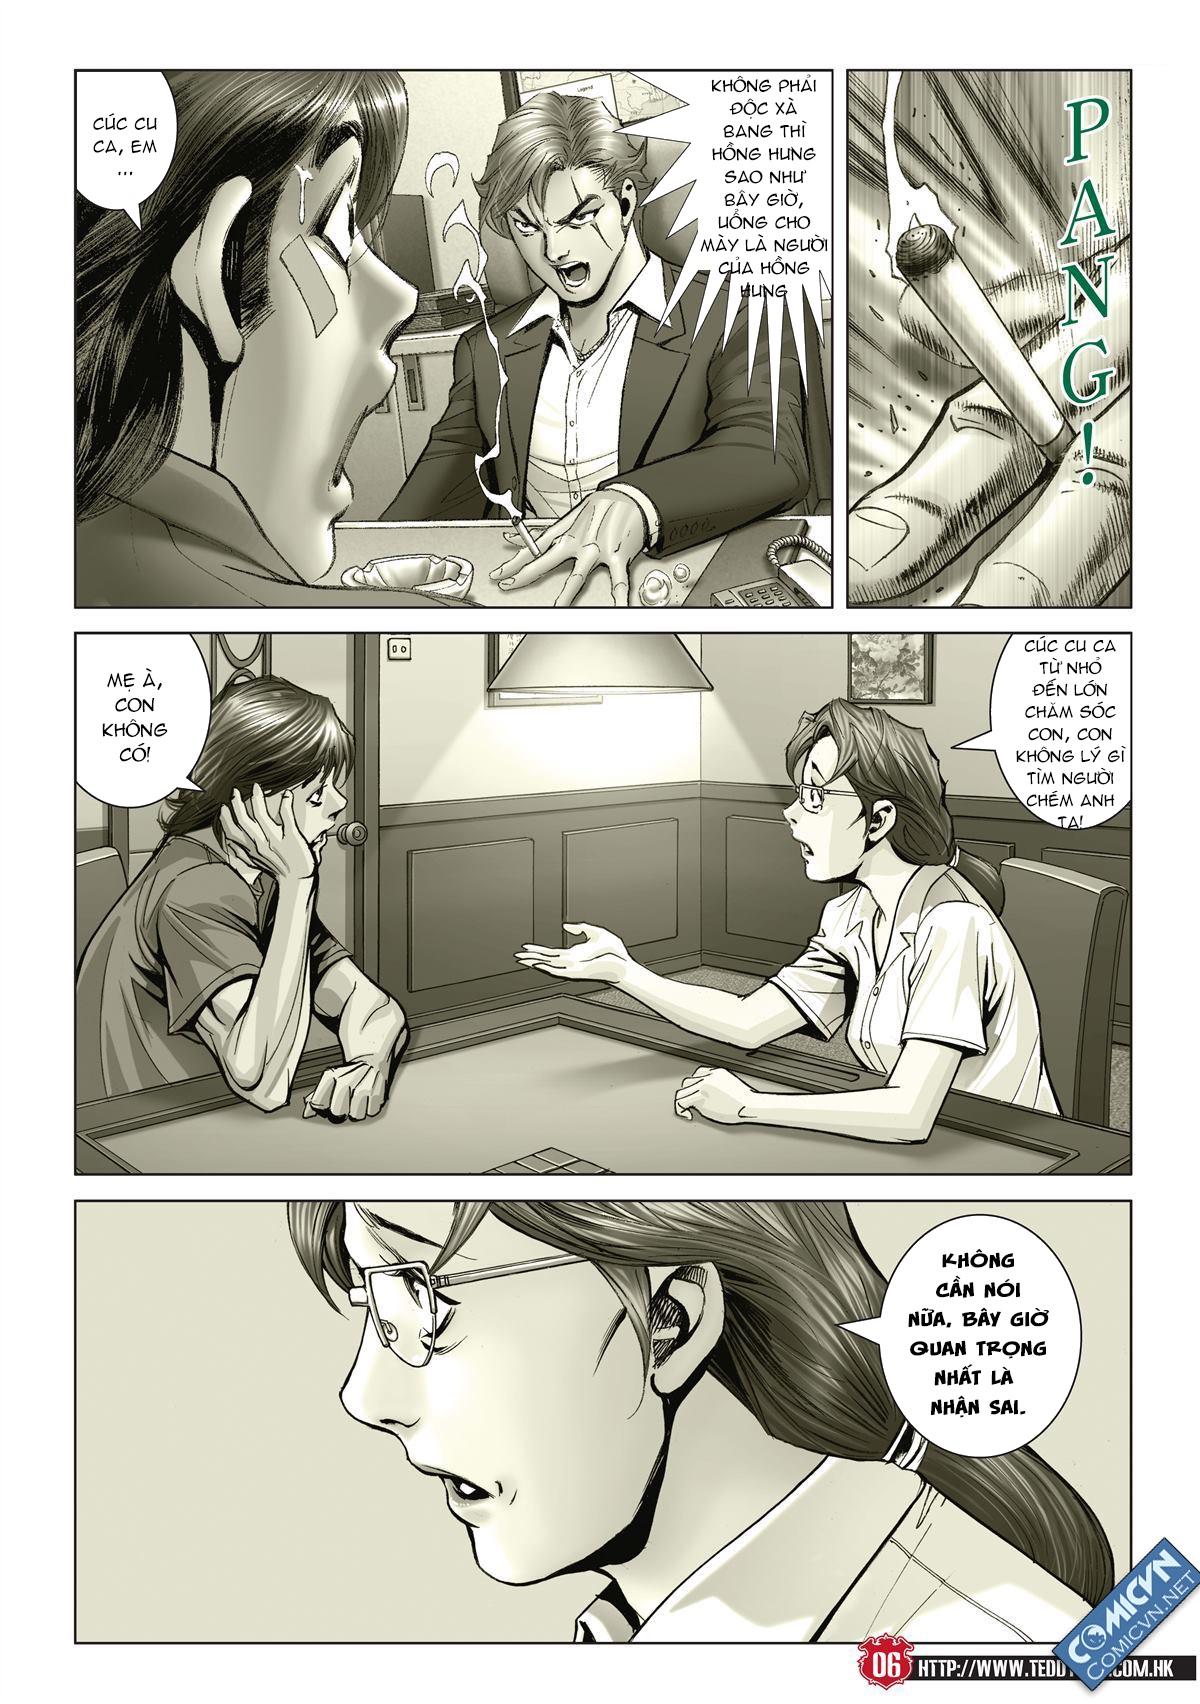 Người Trong Giang Hồ chapter 2001: tự tận trang 5